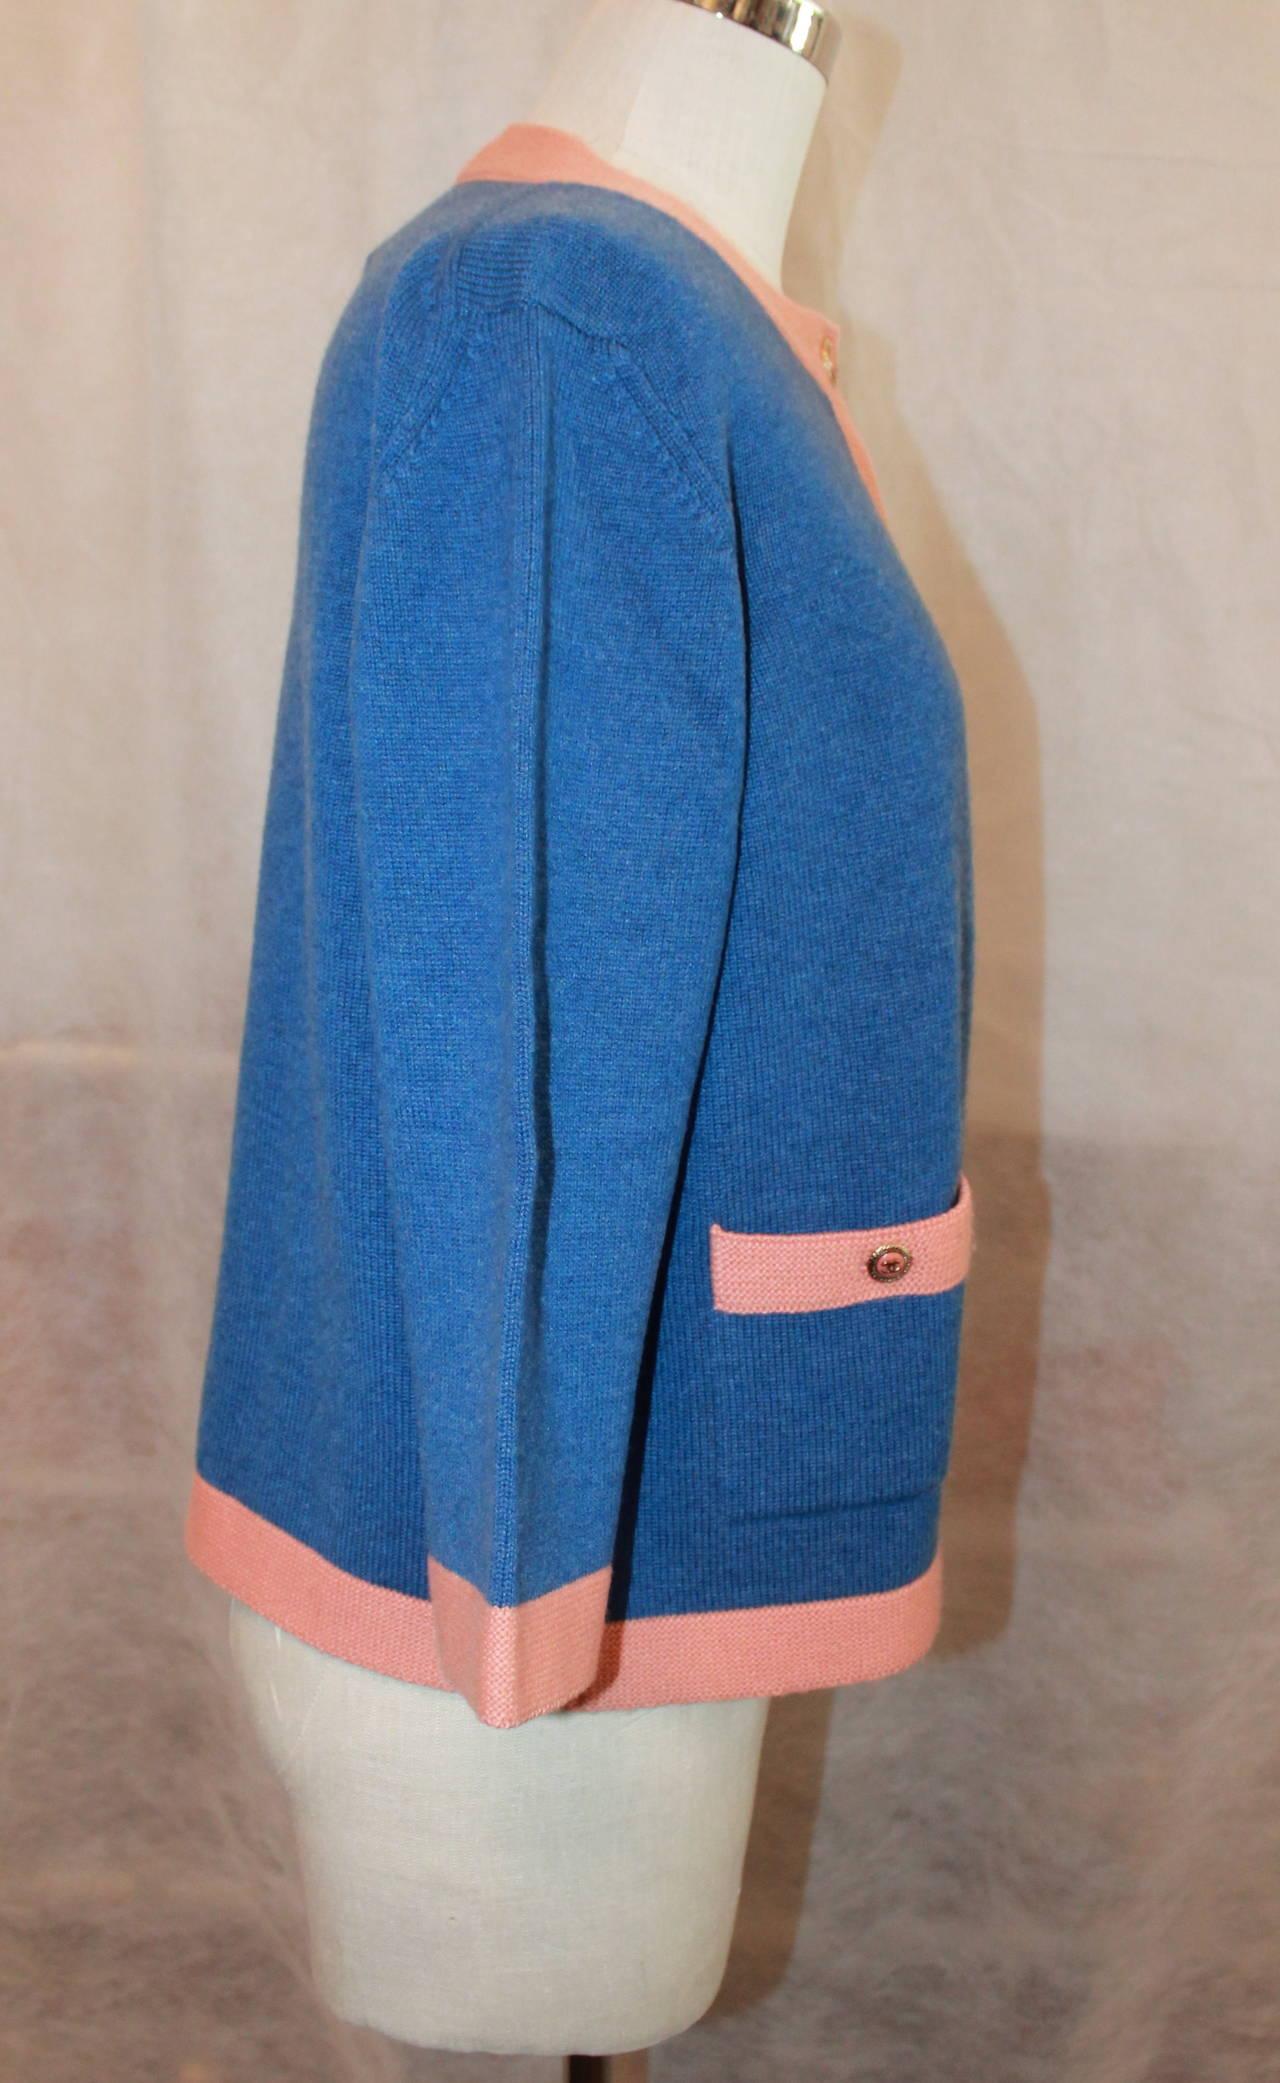 Chanel 2007 Blue & Peach Cashmere Sweater - 46 4